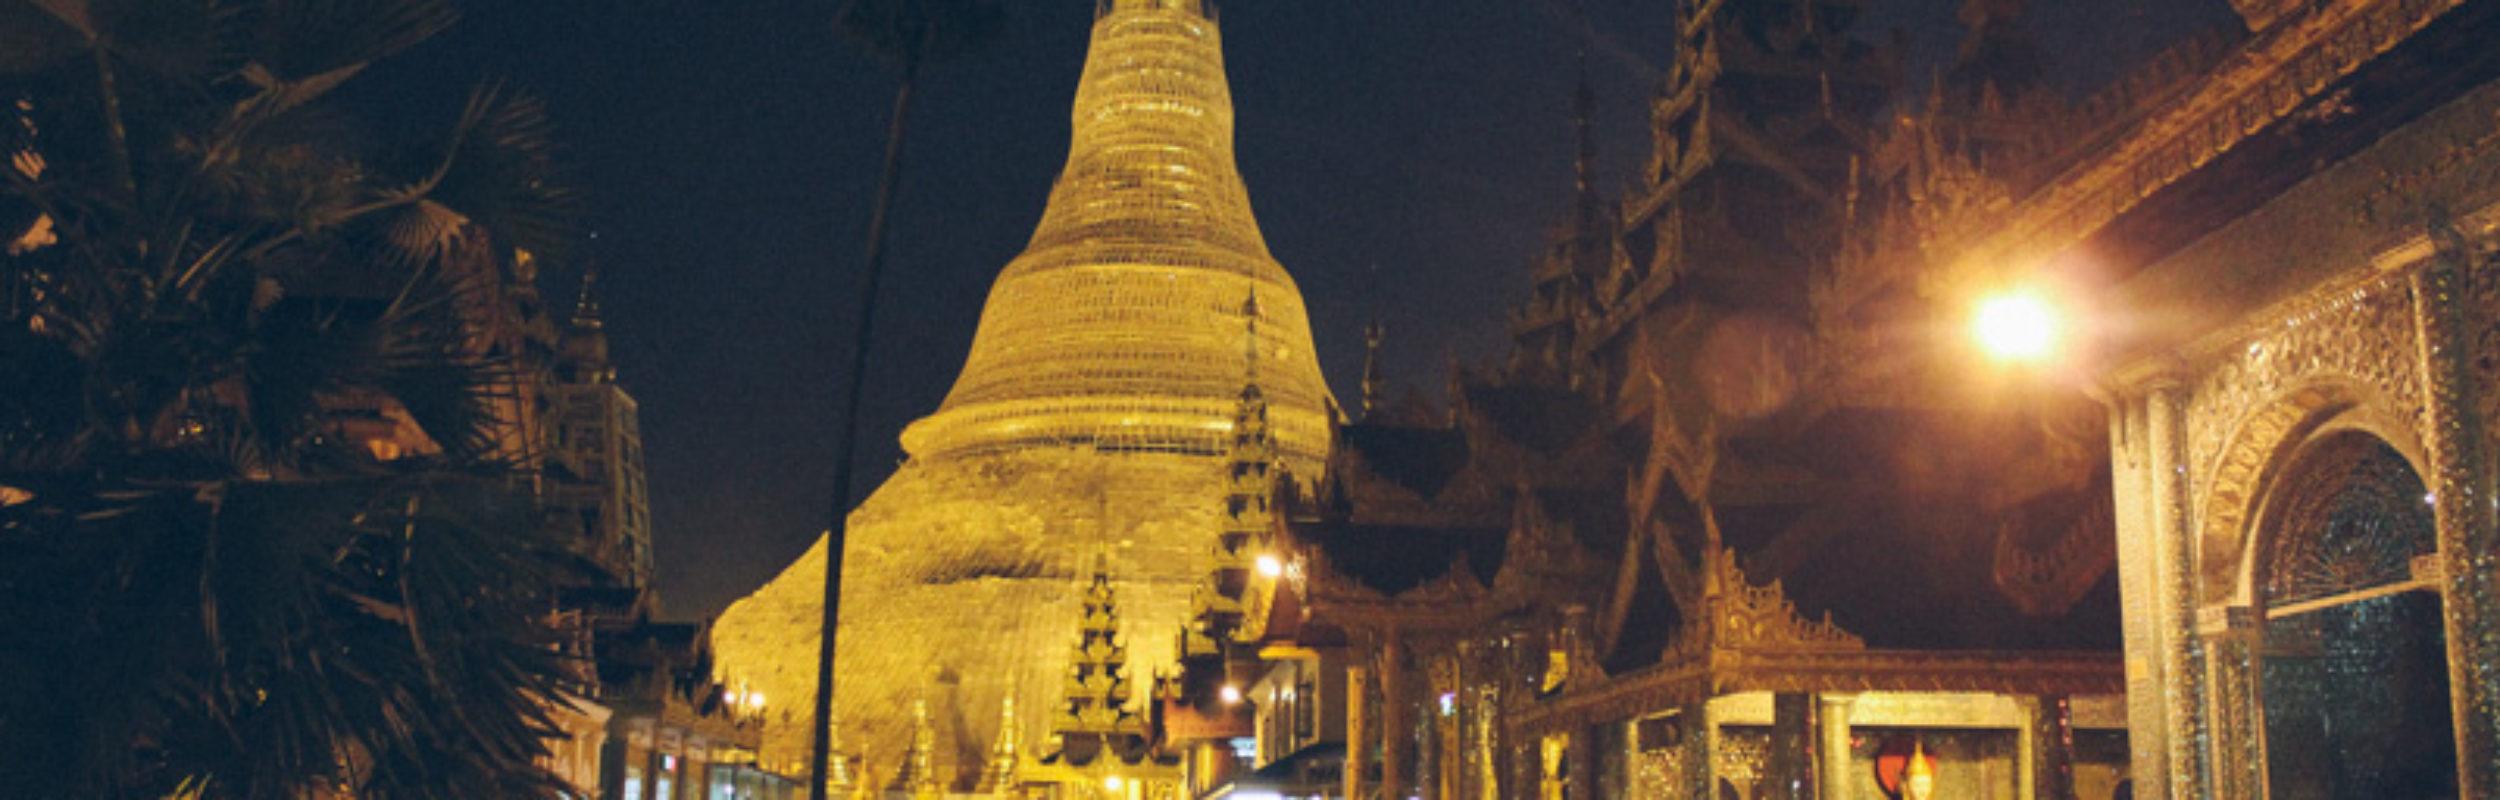 Birmanie : l'extraordinaire pagode Shwedagon de Rangoon